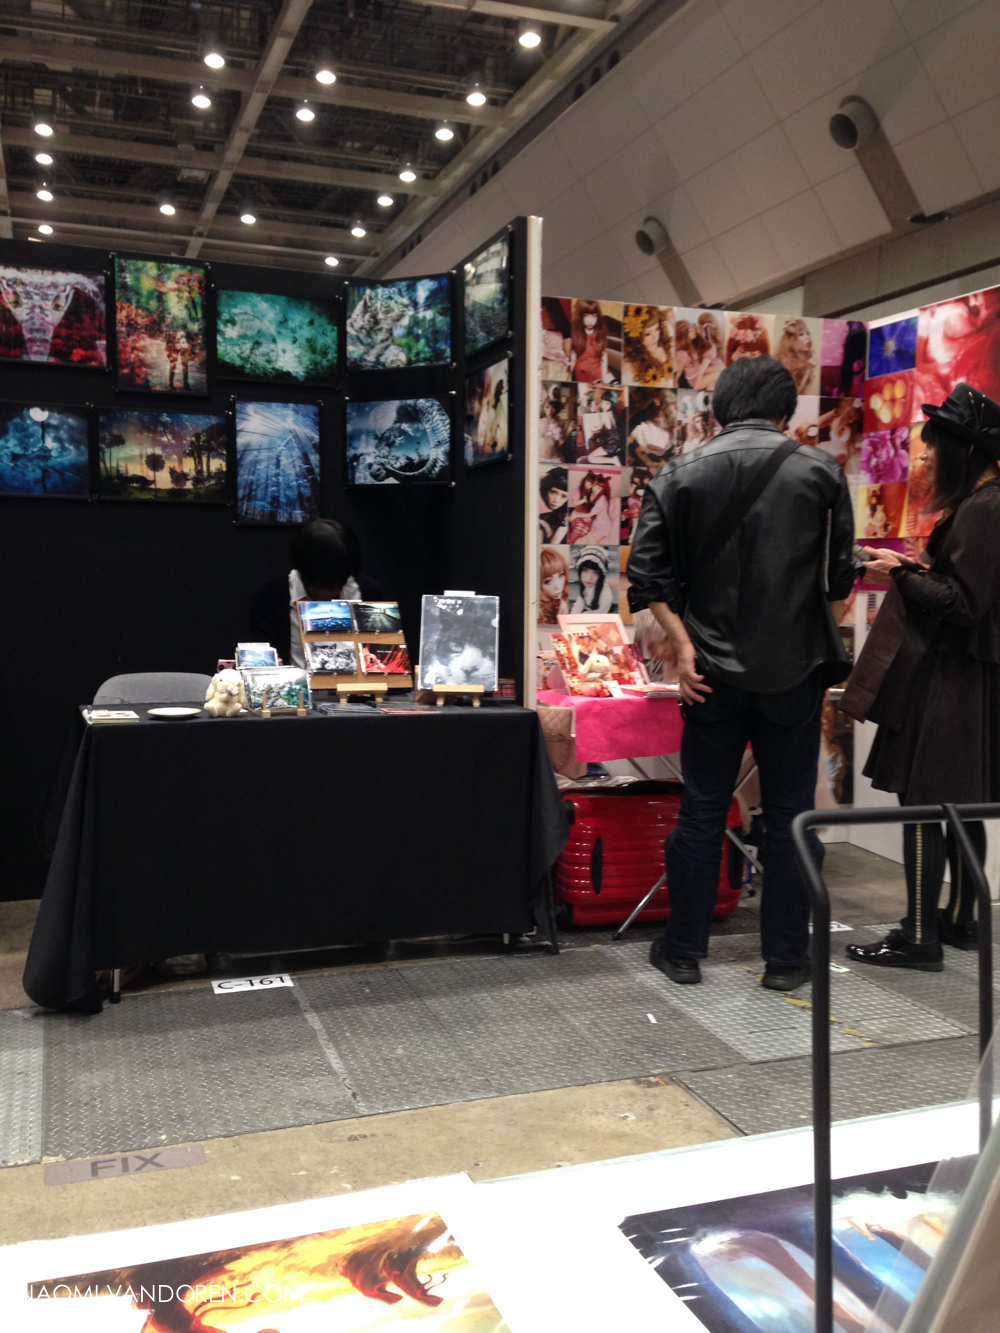 design festa tokyo japan art show naomi vandoren-42.jpg